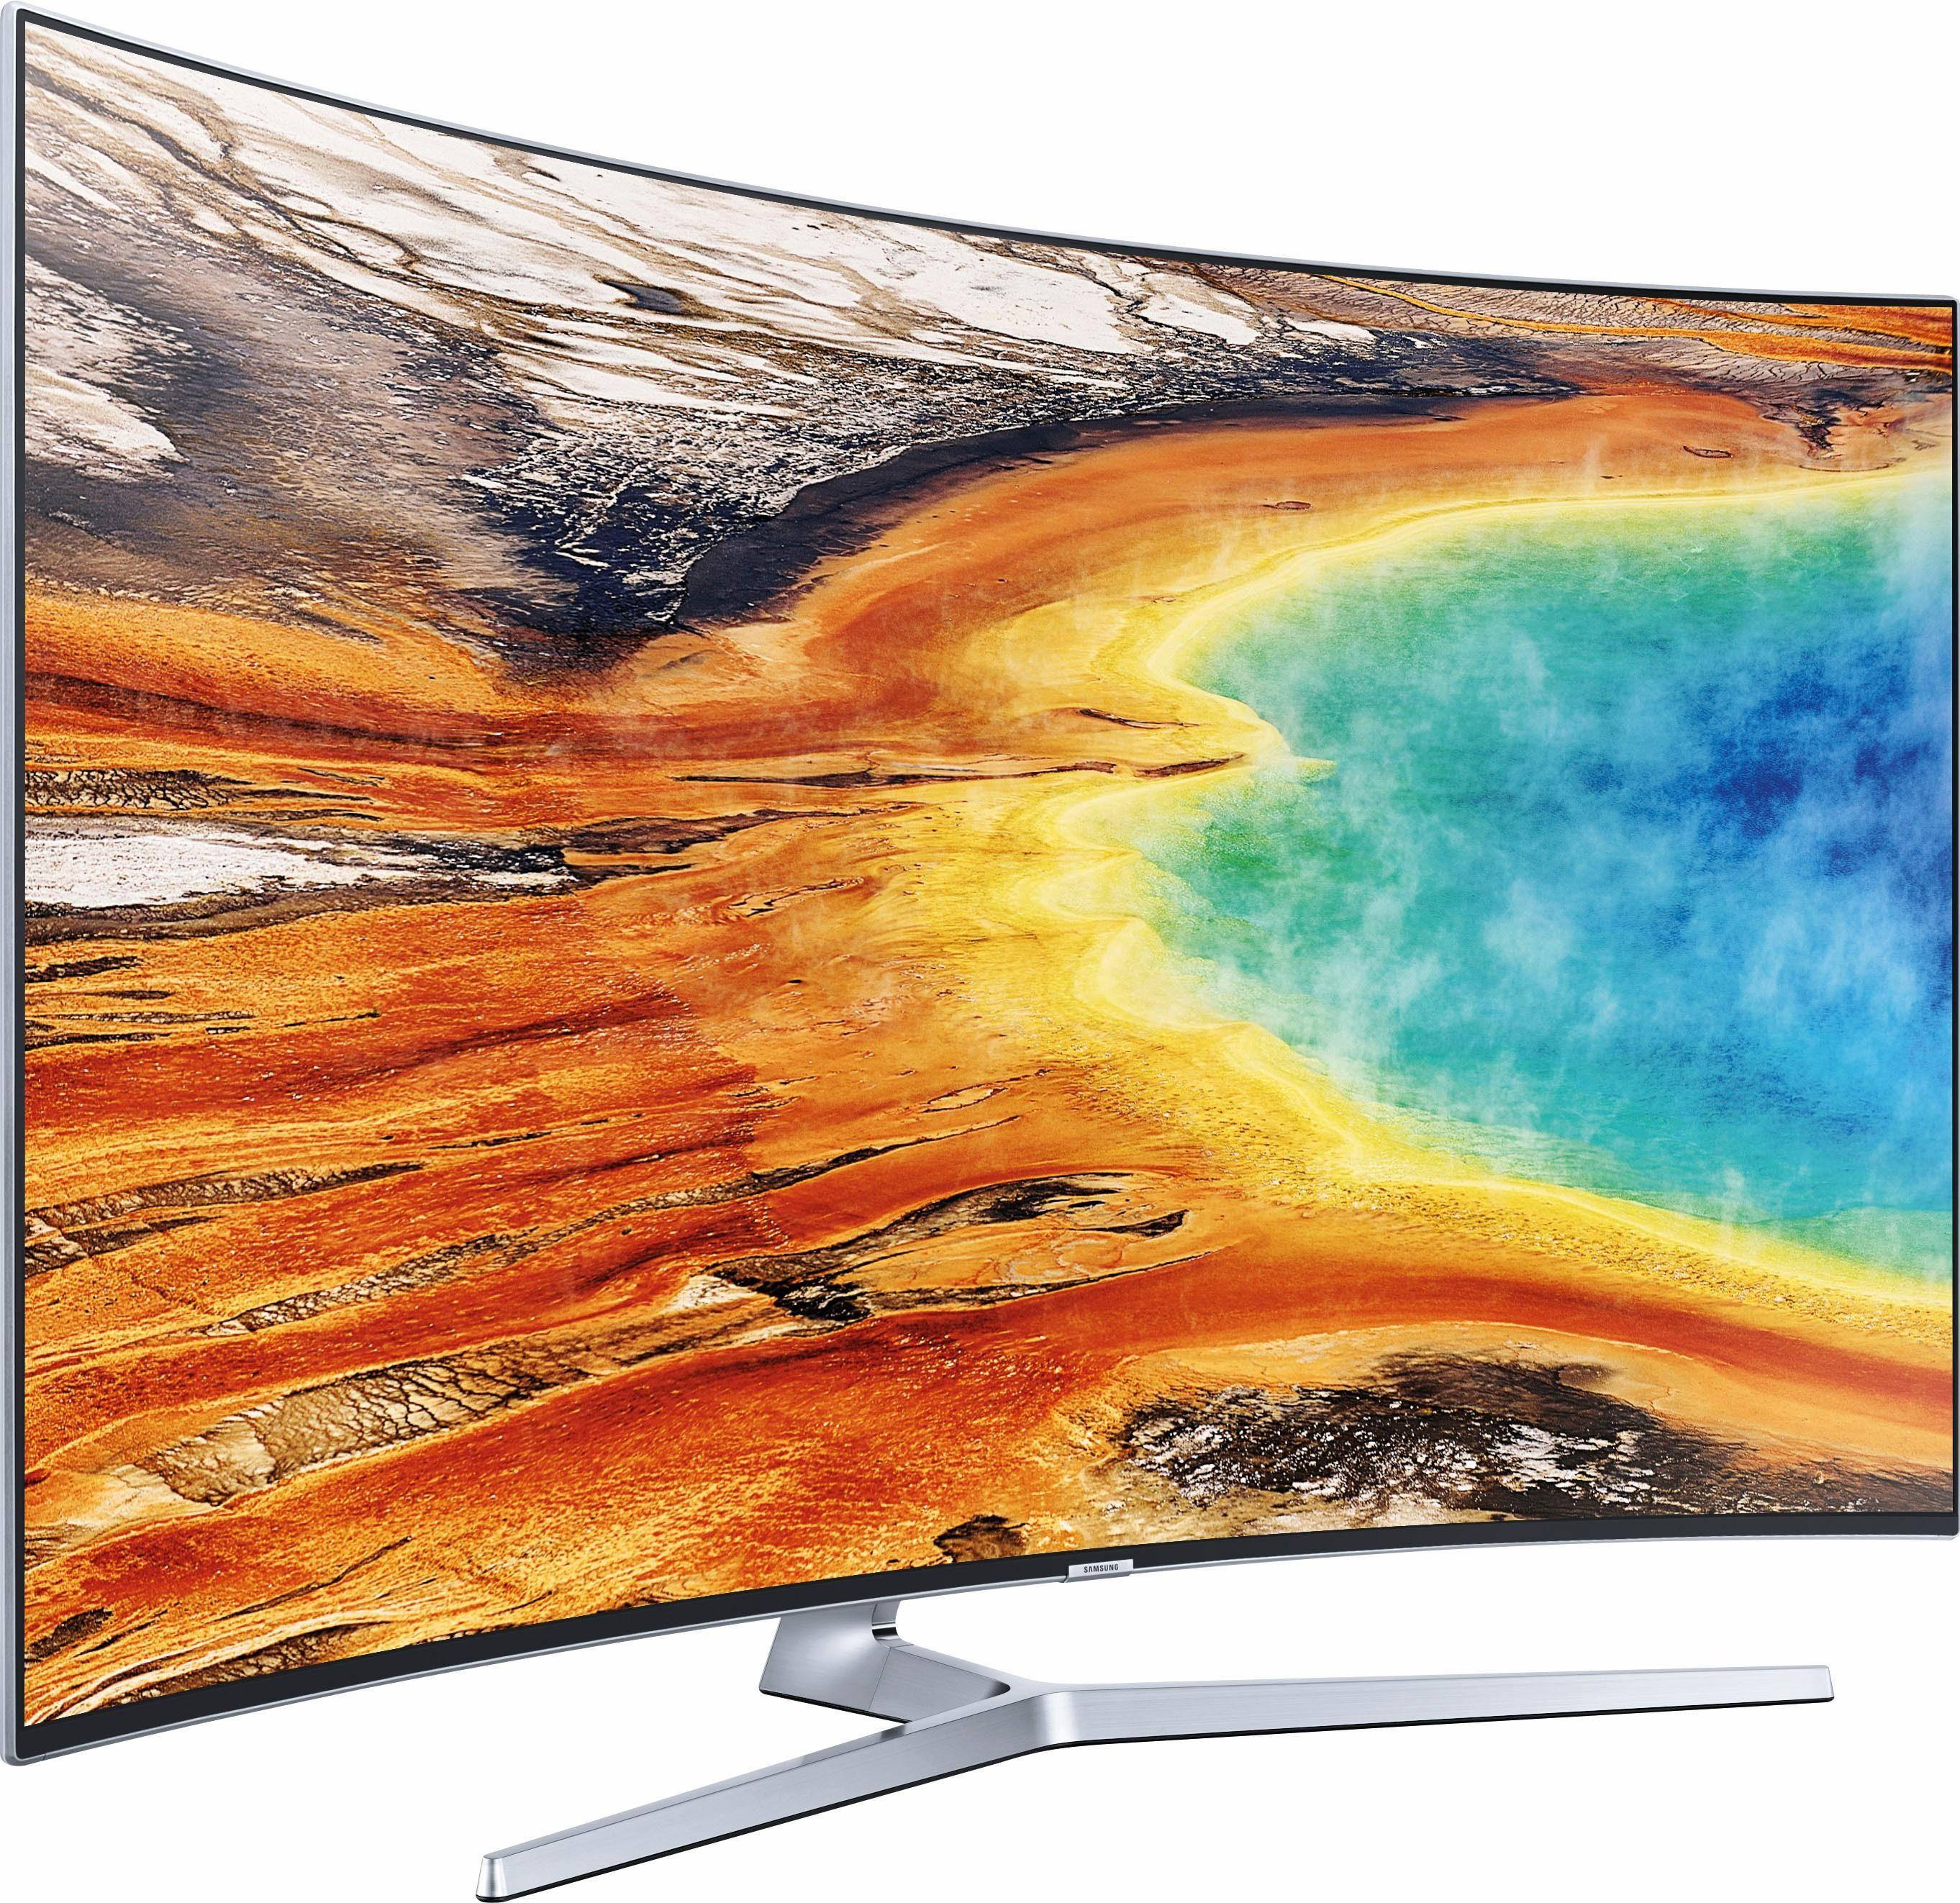 Samsung UE65MU9009TXZG Curved LED Fernseher (163 cm / 65 Zoll, UHD/4K, Smart-TV)